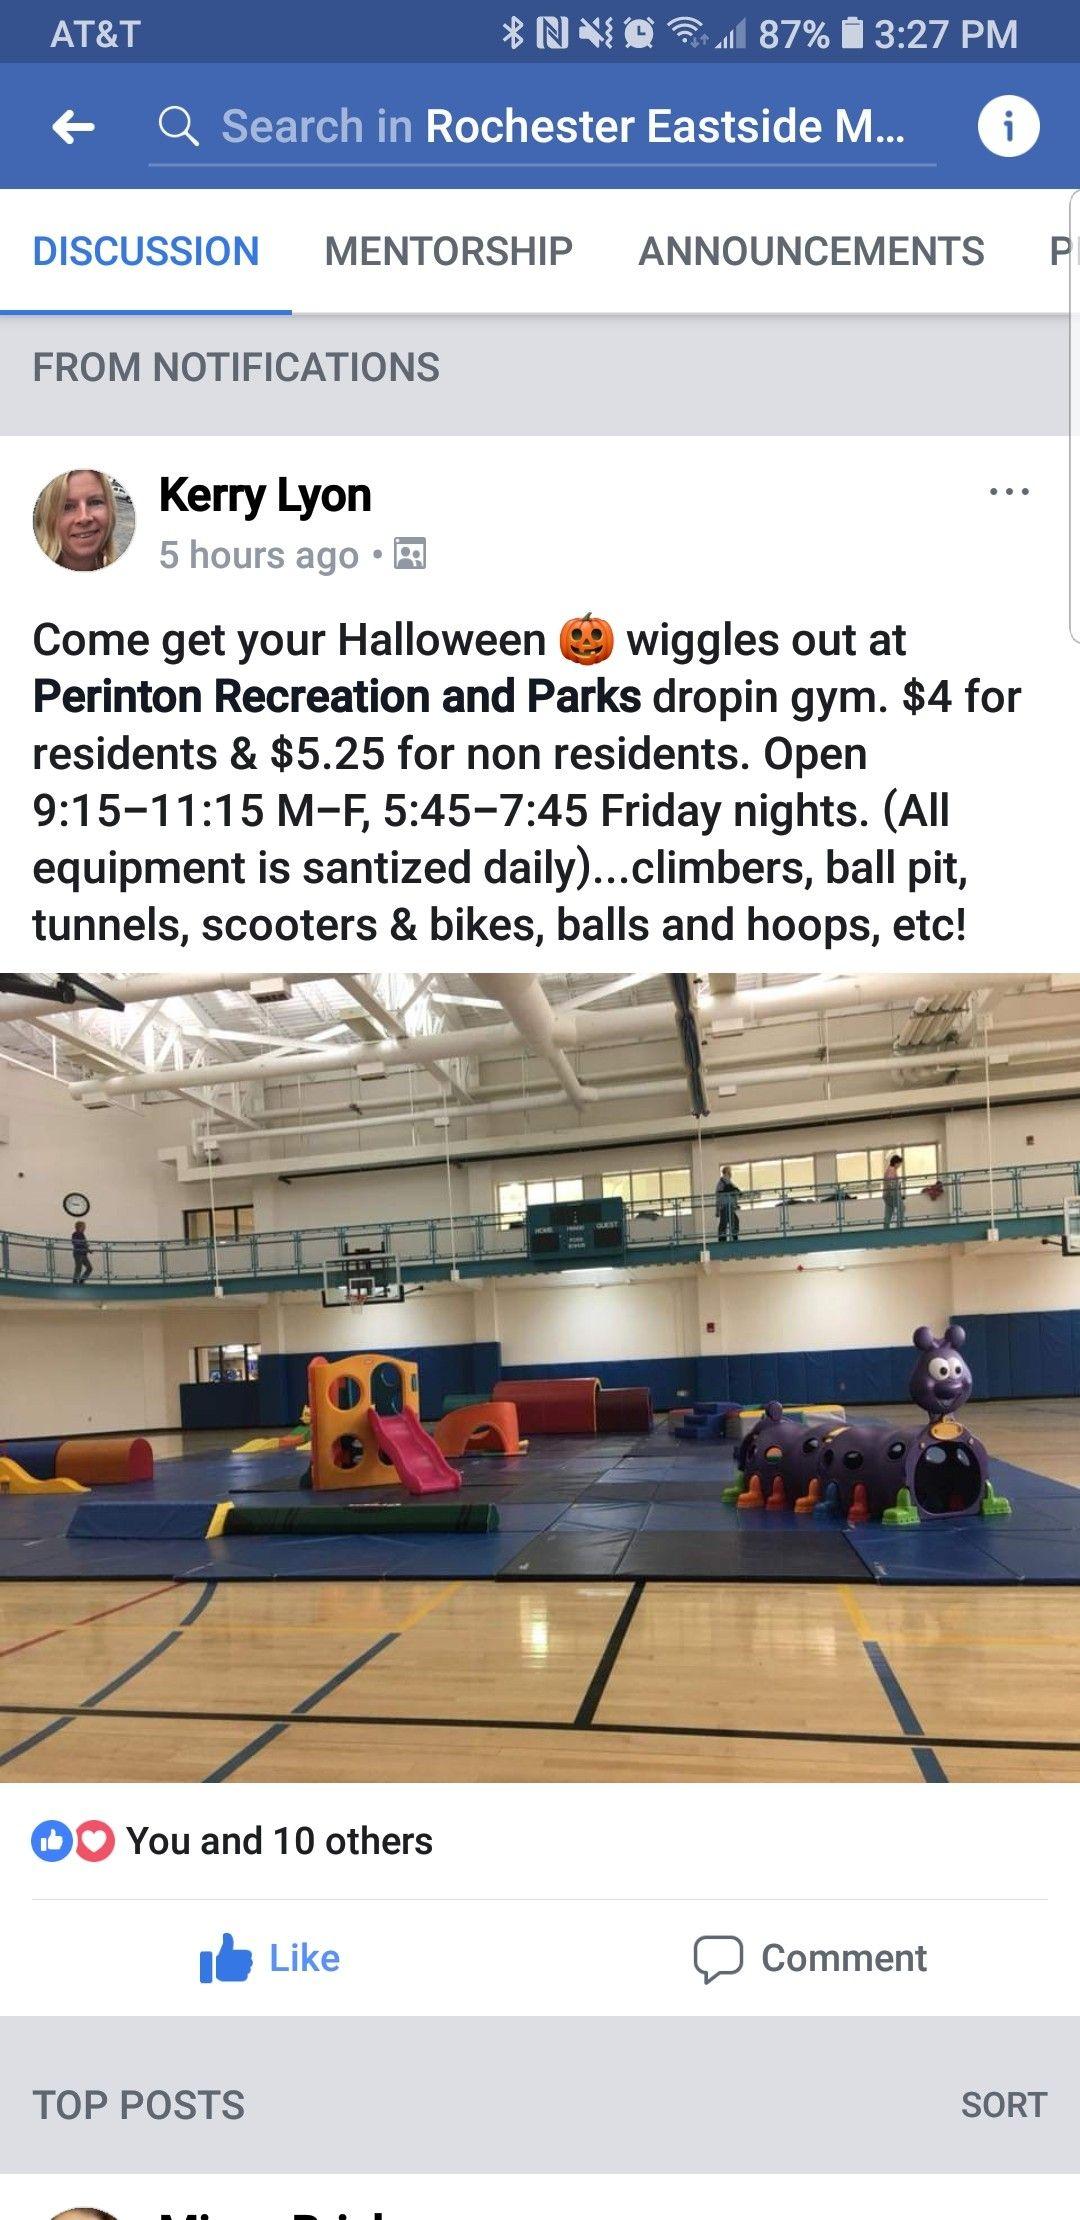 Perington Rec Mentorship Recreation Eastside